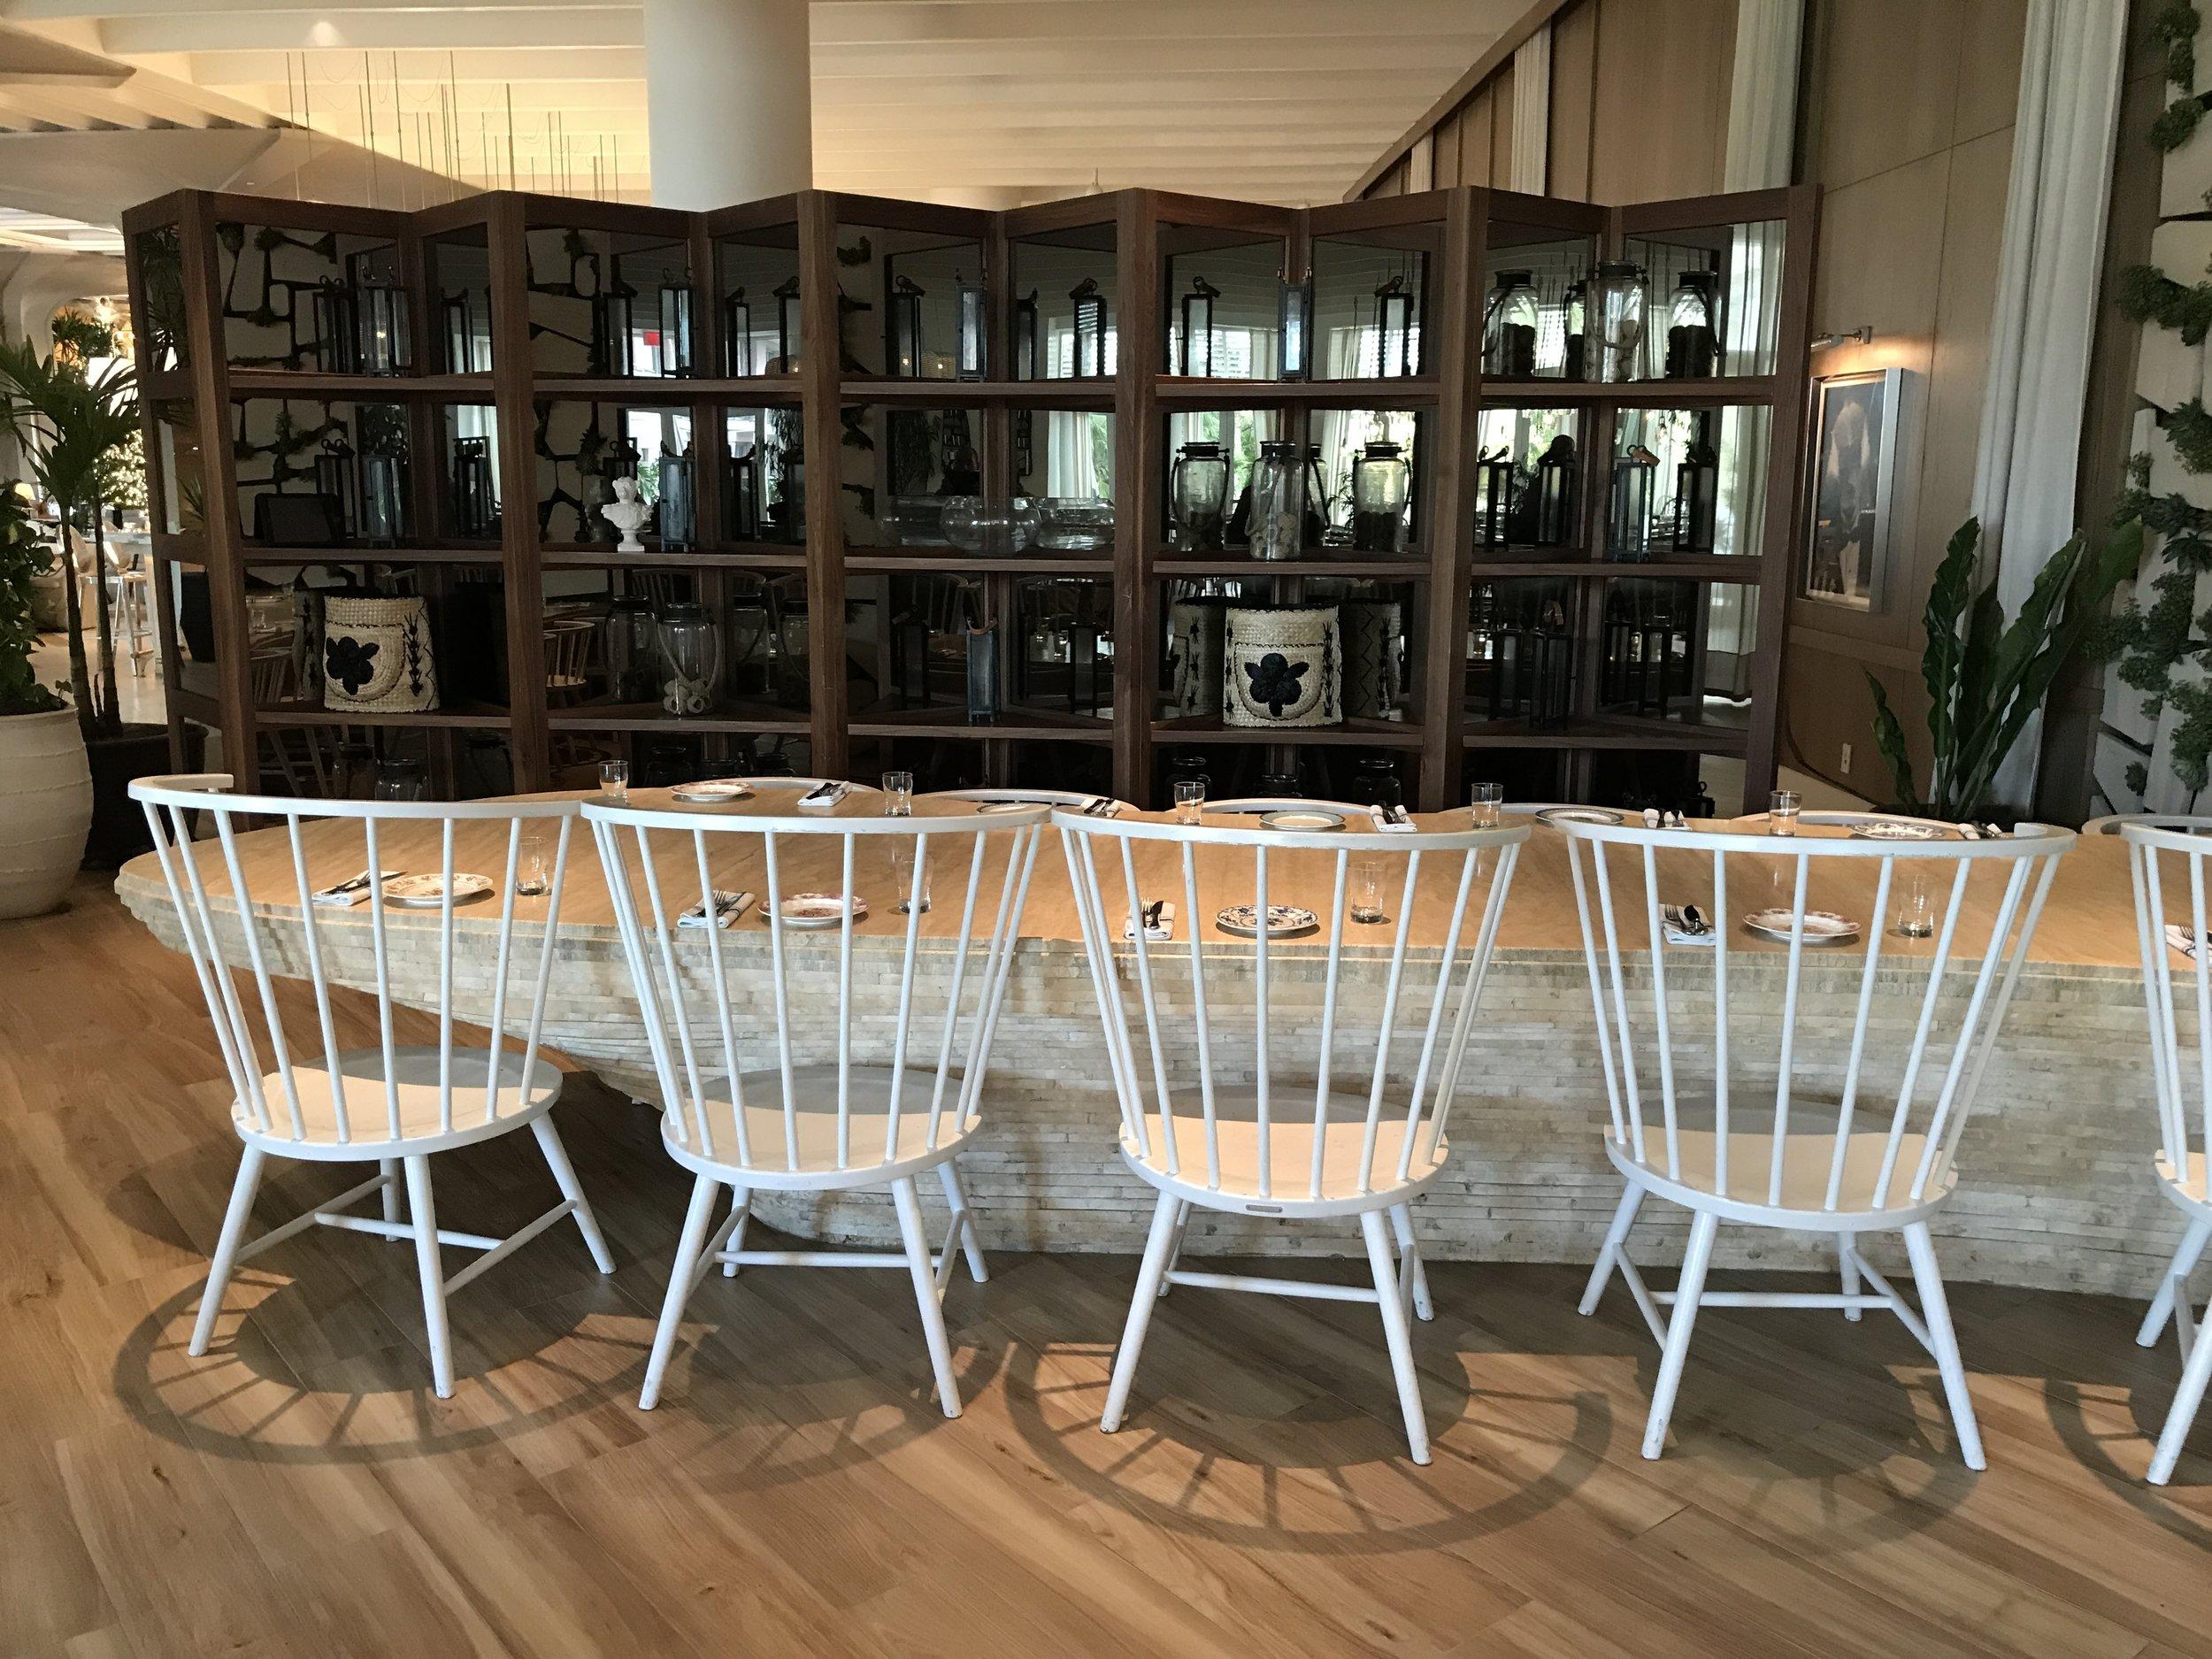 Cleo Restaurant_PDG_Tenant Improvement9.JPG